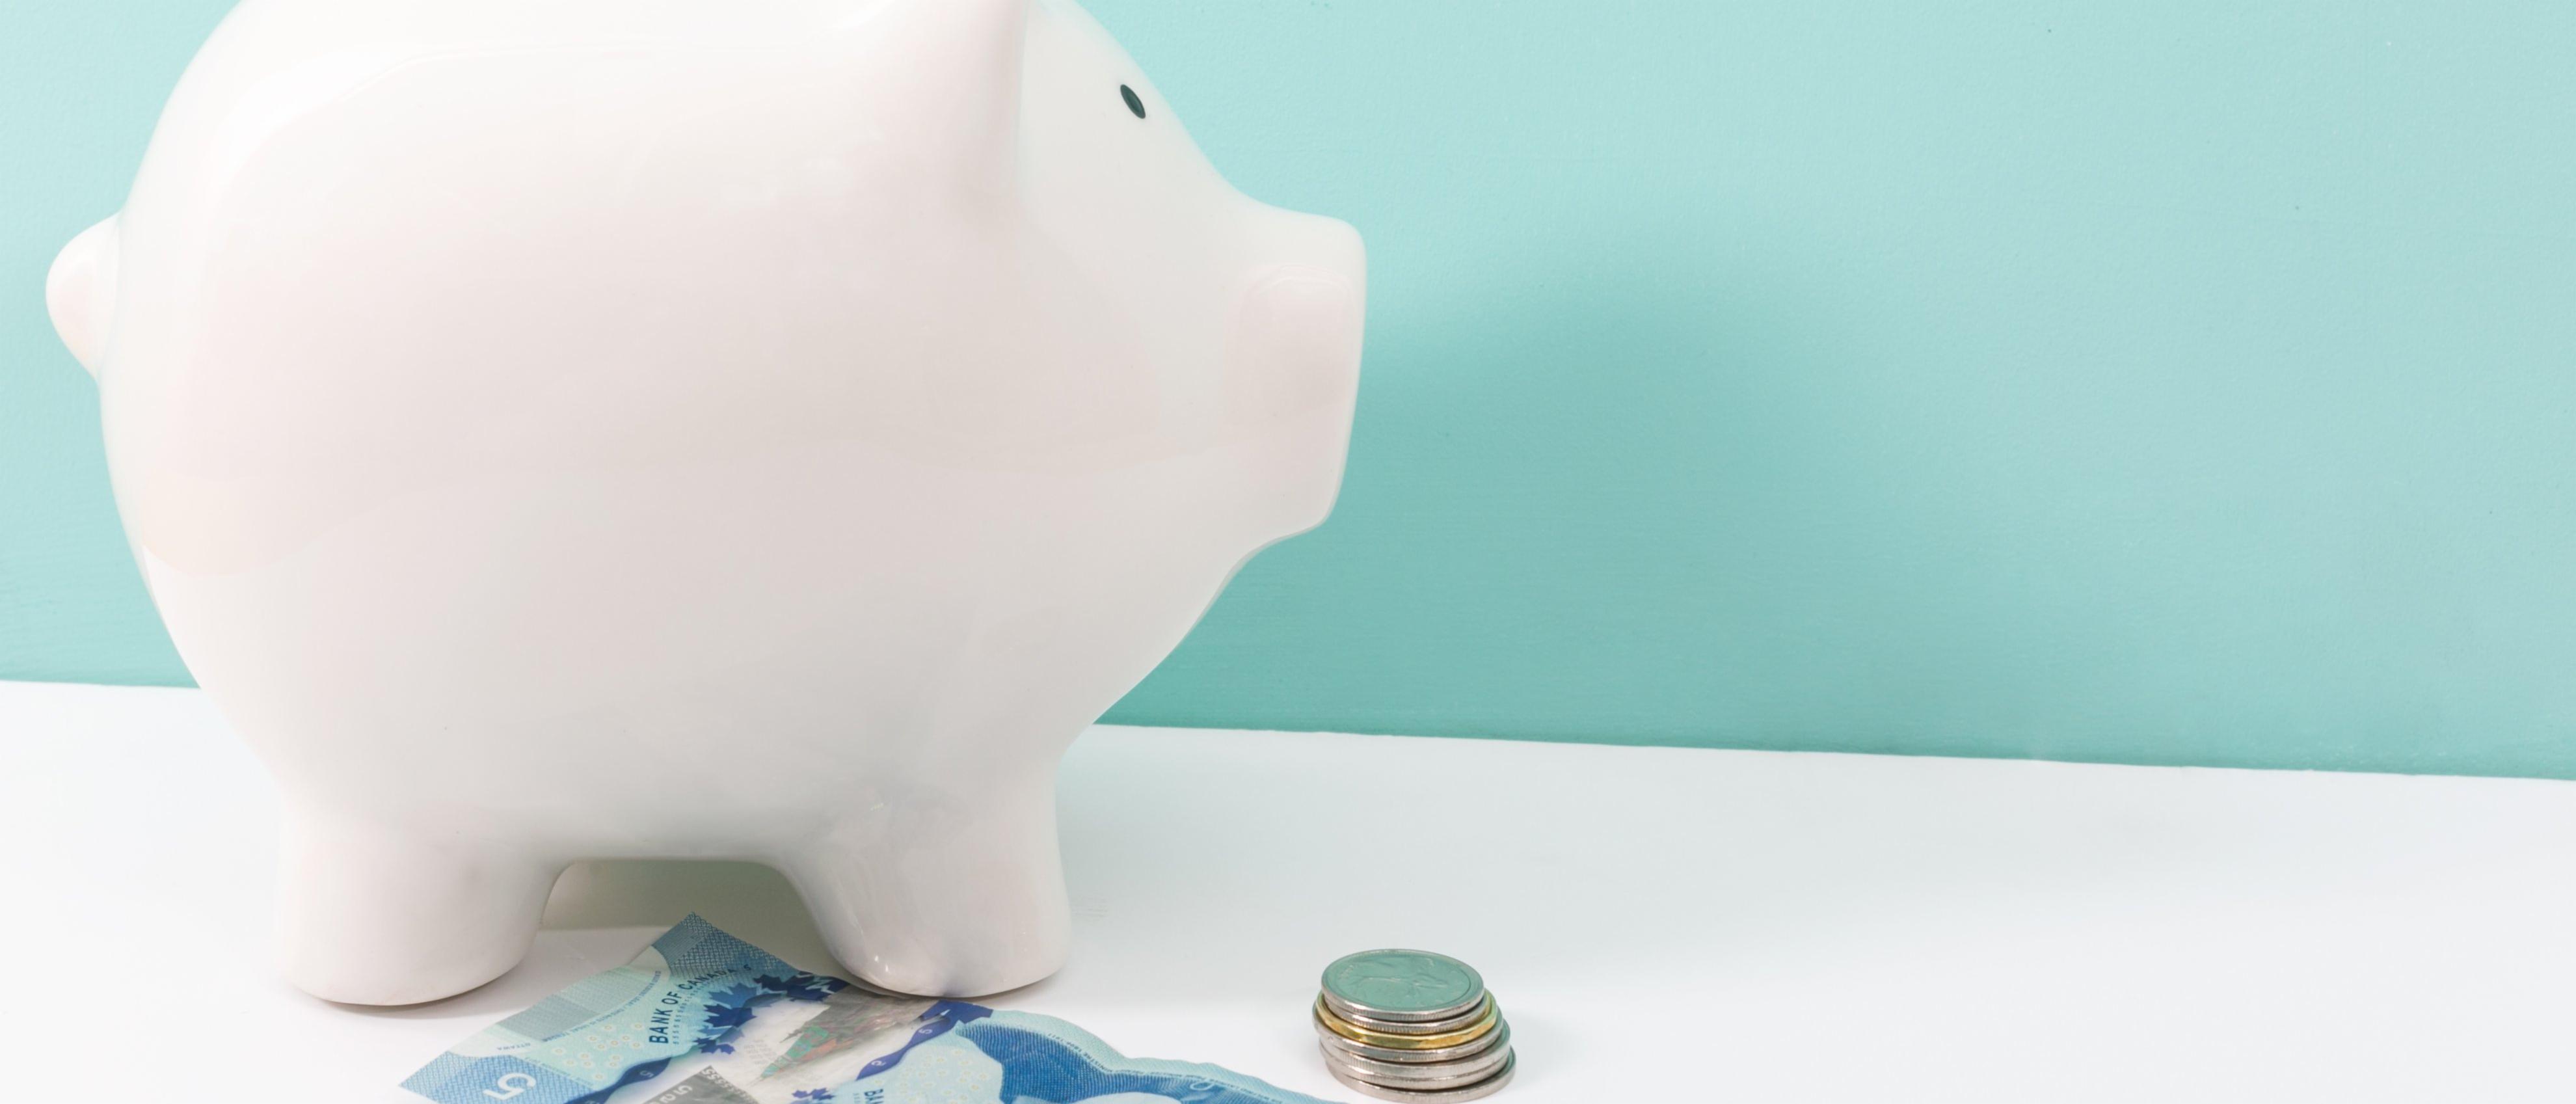 custom-Custom_Size___saving-money-in-piggy-bank_4460x4460